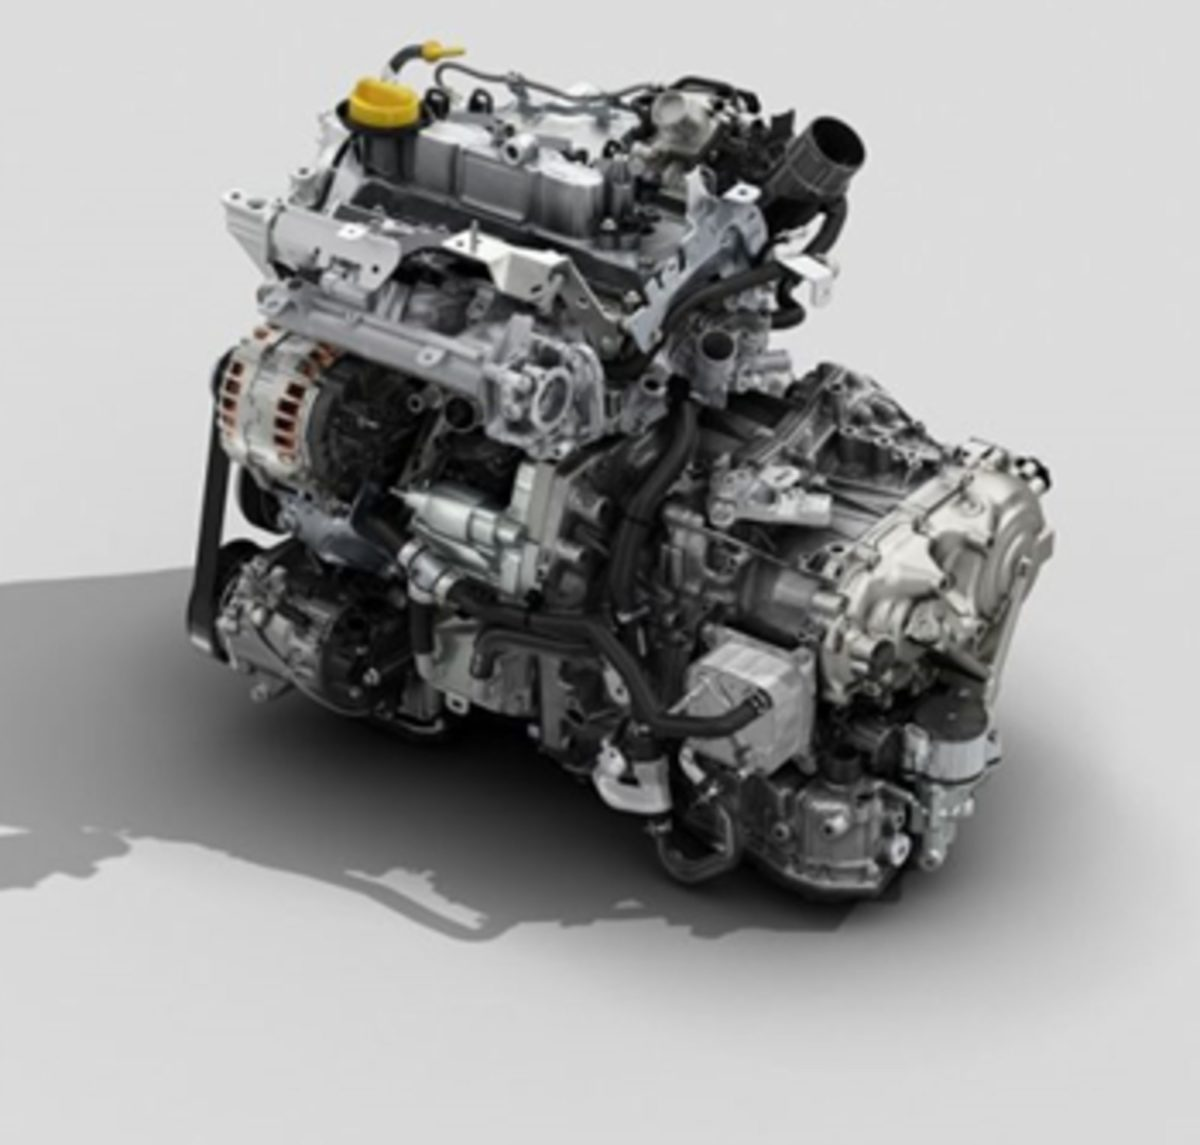 Nissan Magnite HRA0 CVT engine